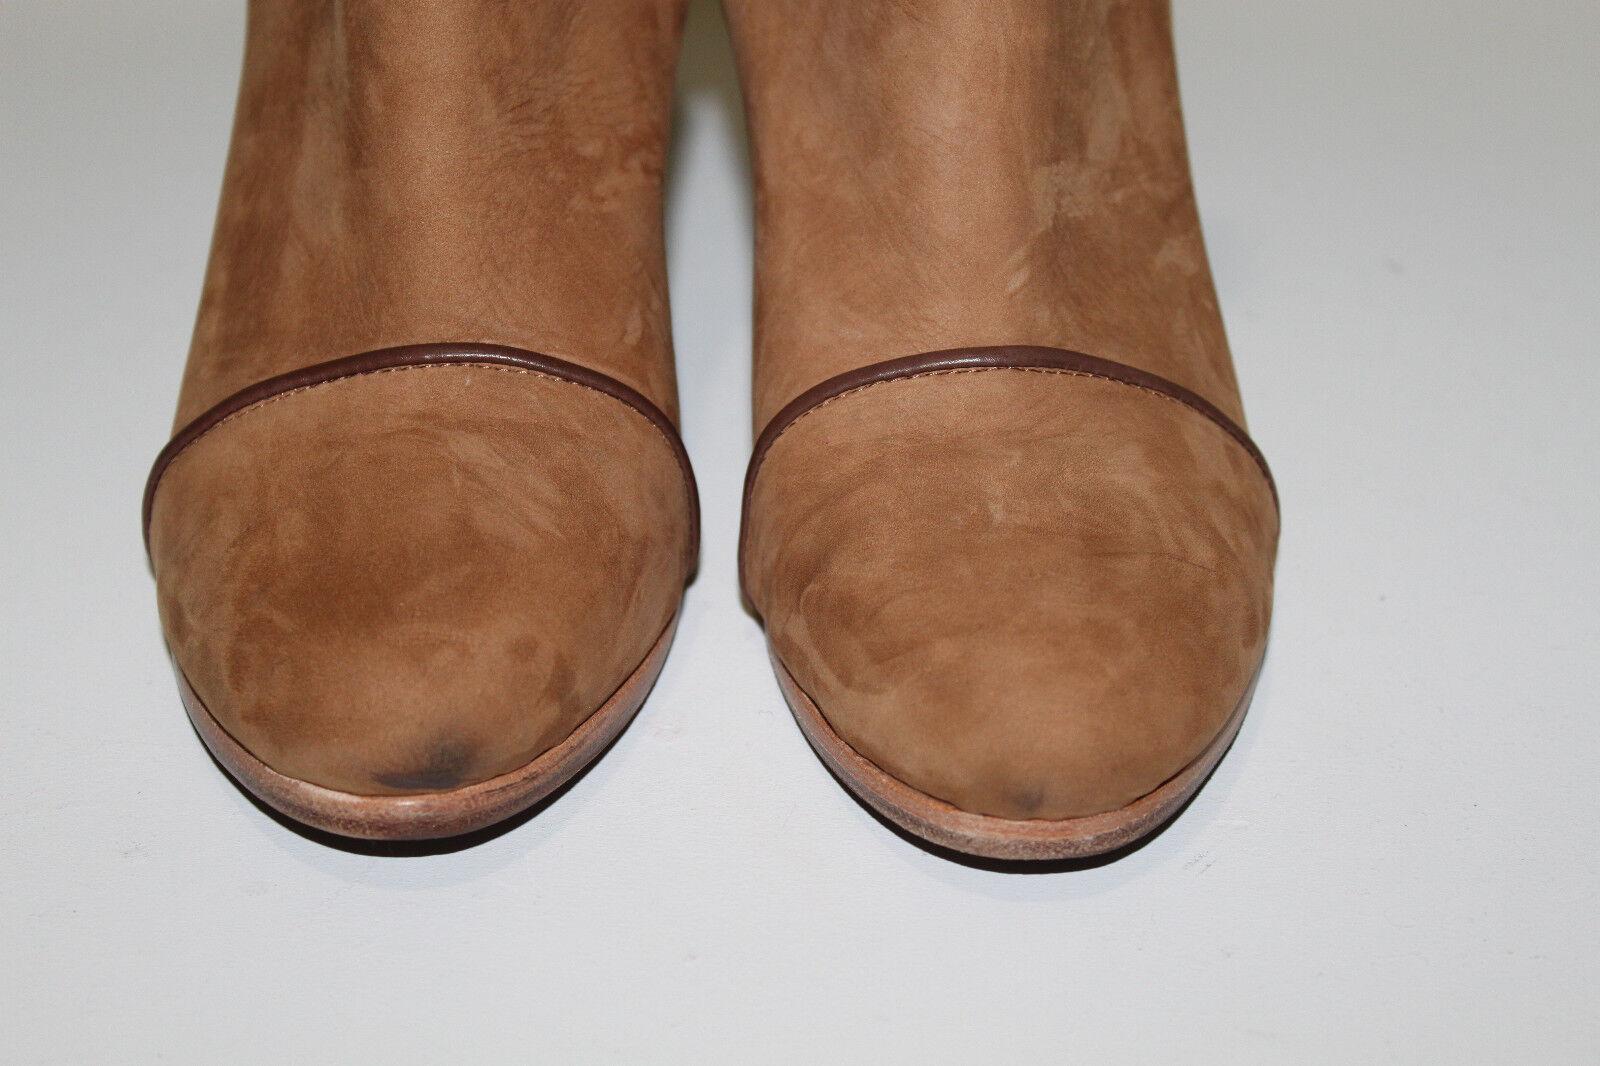 Rag & & Rag Bone 9.5 39.5 Kinsey Carmel Tan Suede Braun Strap Ankle Heel Bootie schuhes 7546ab